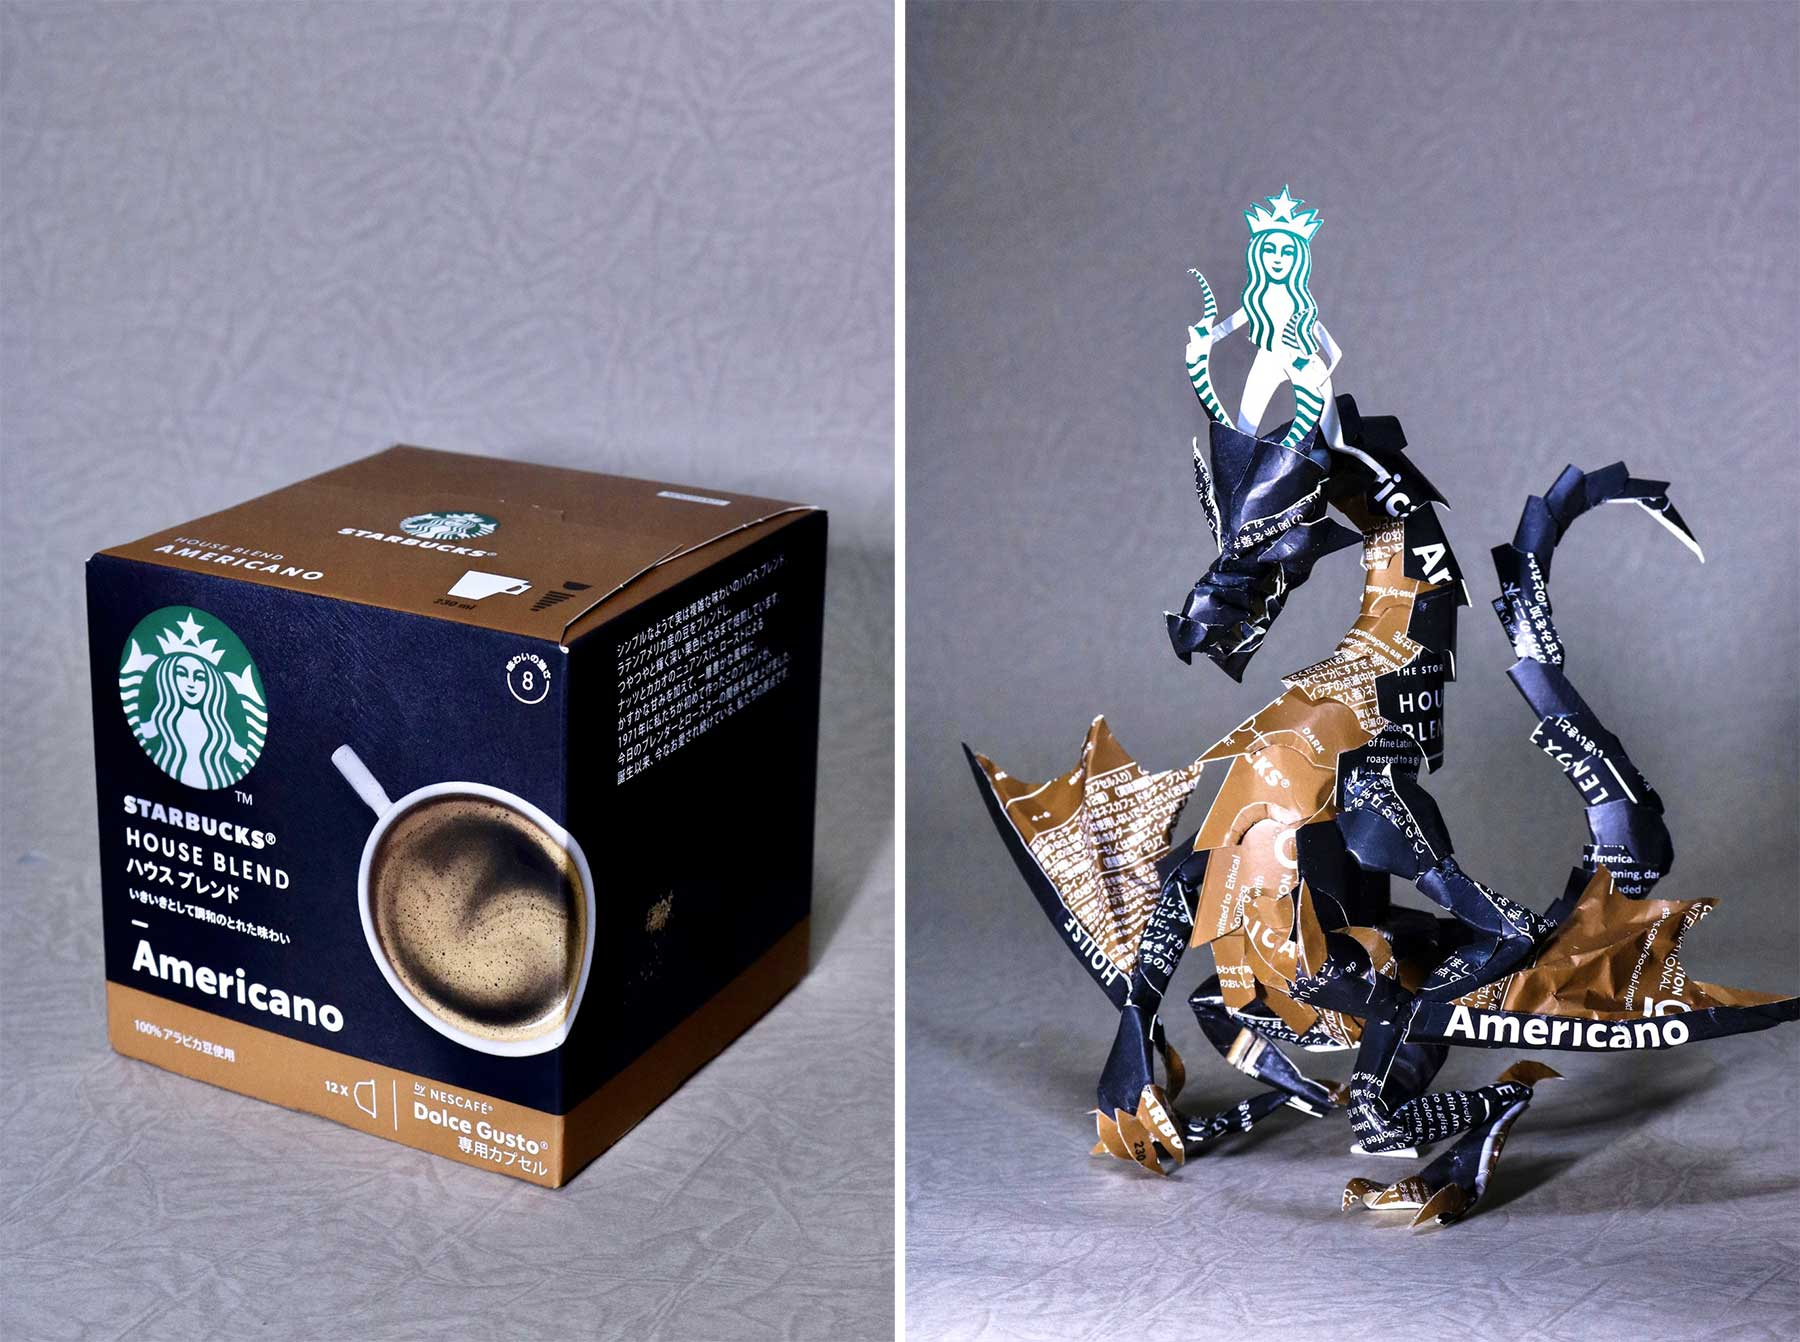 Neue Verpackungs-Skulpturen von Haruki verpackungsskulpturen-haruki-2020_08